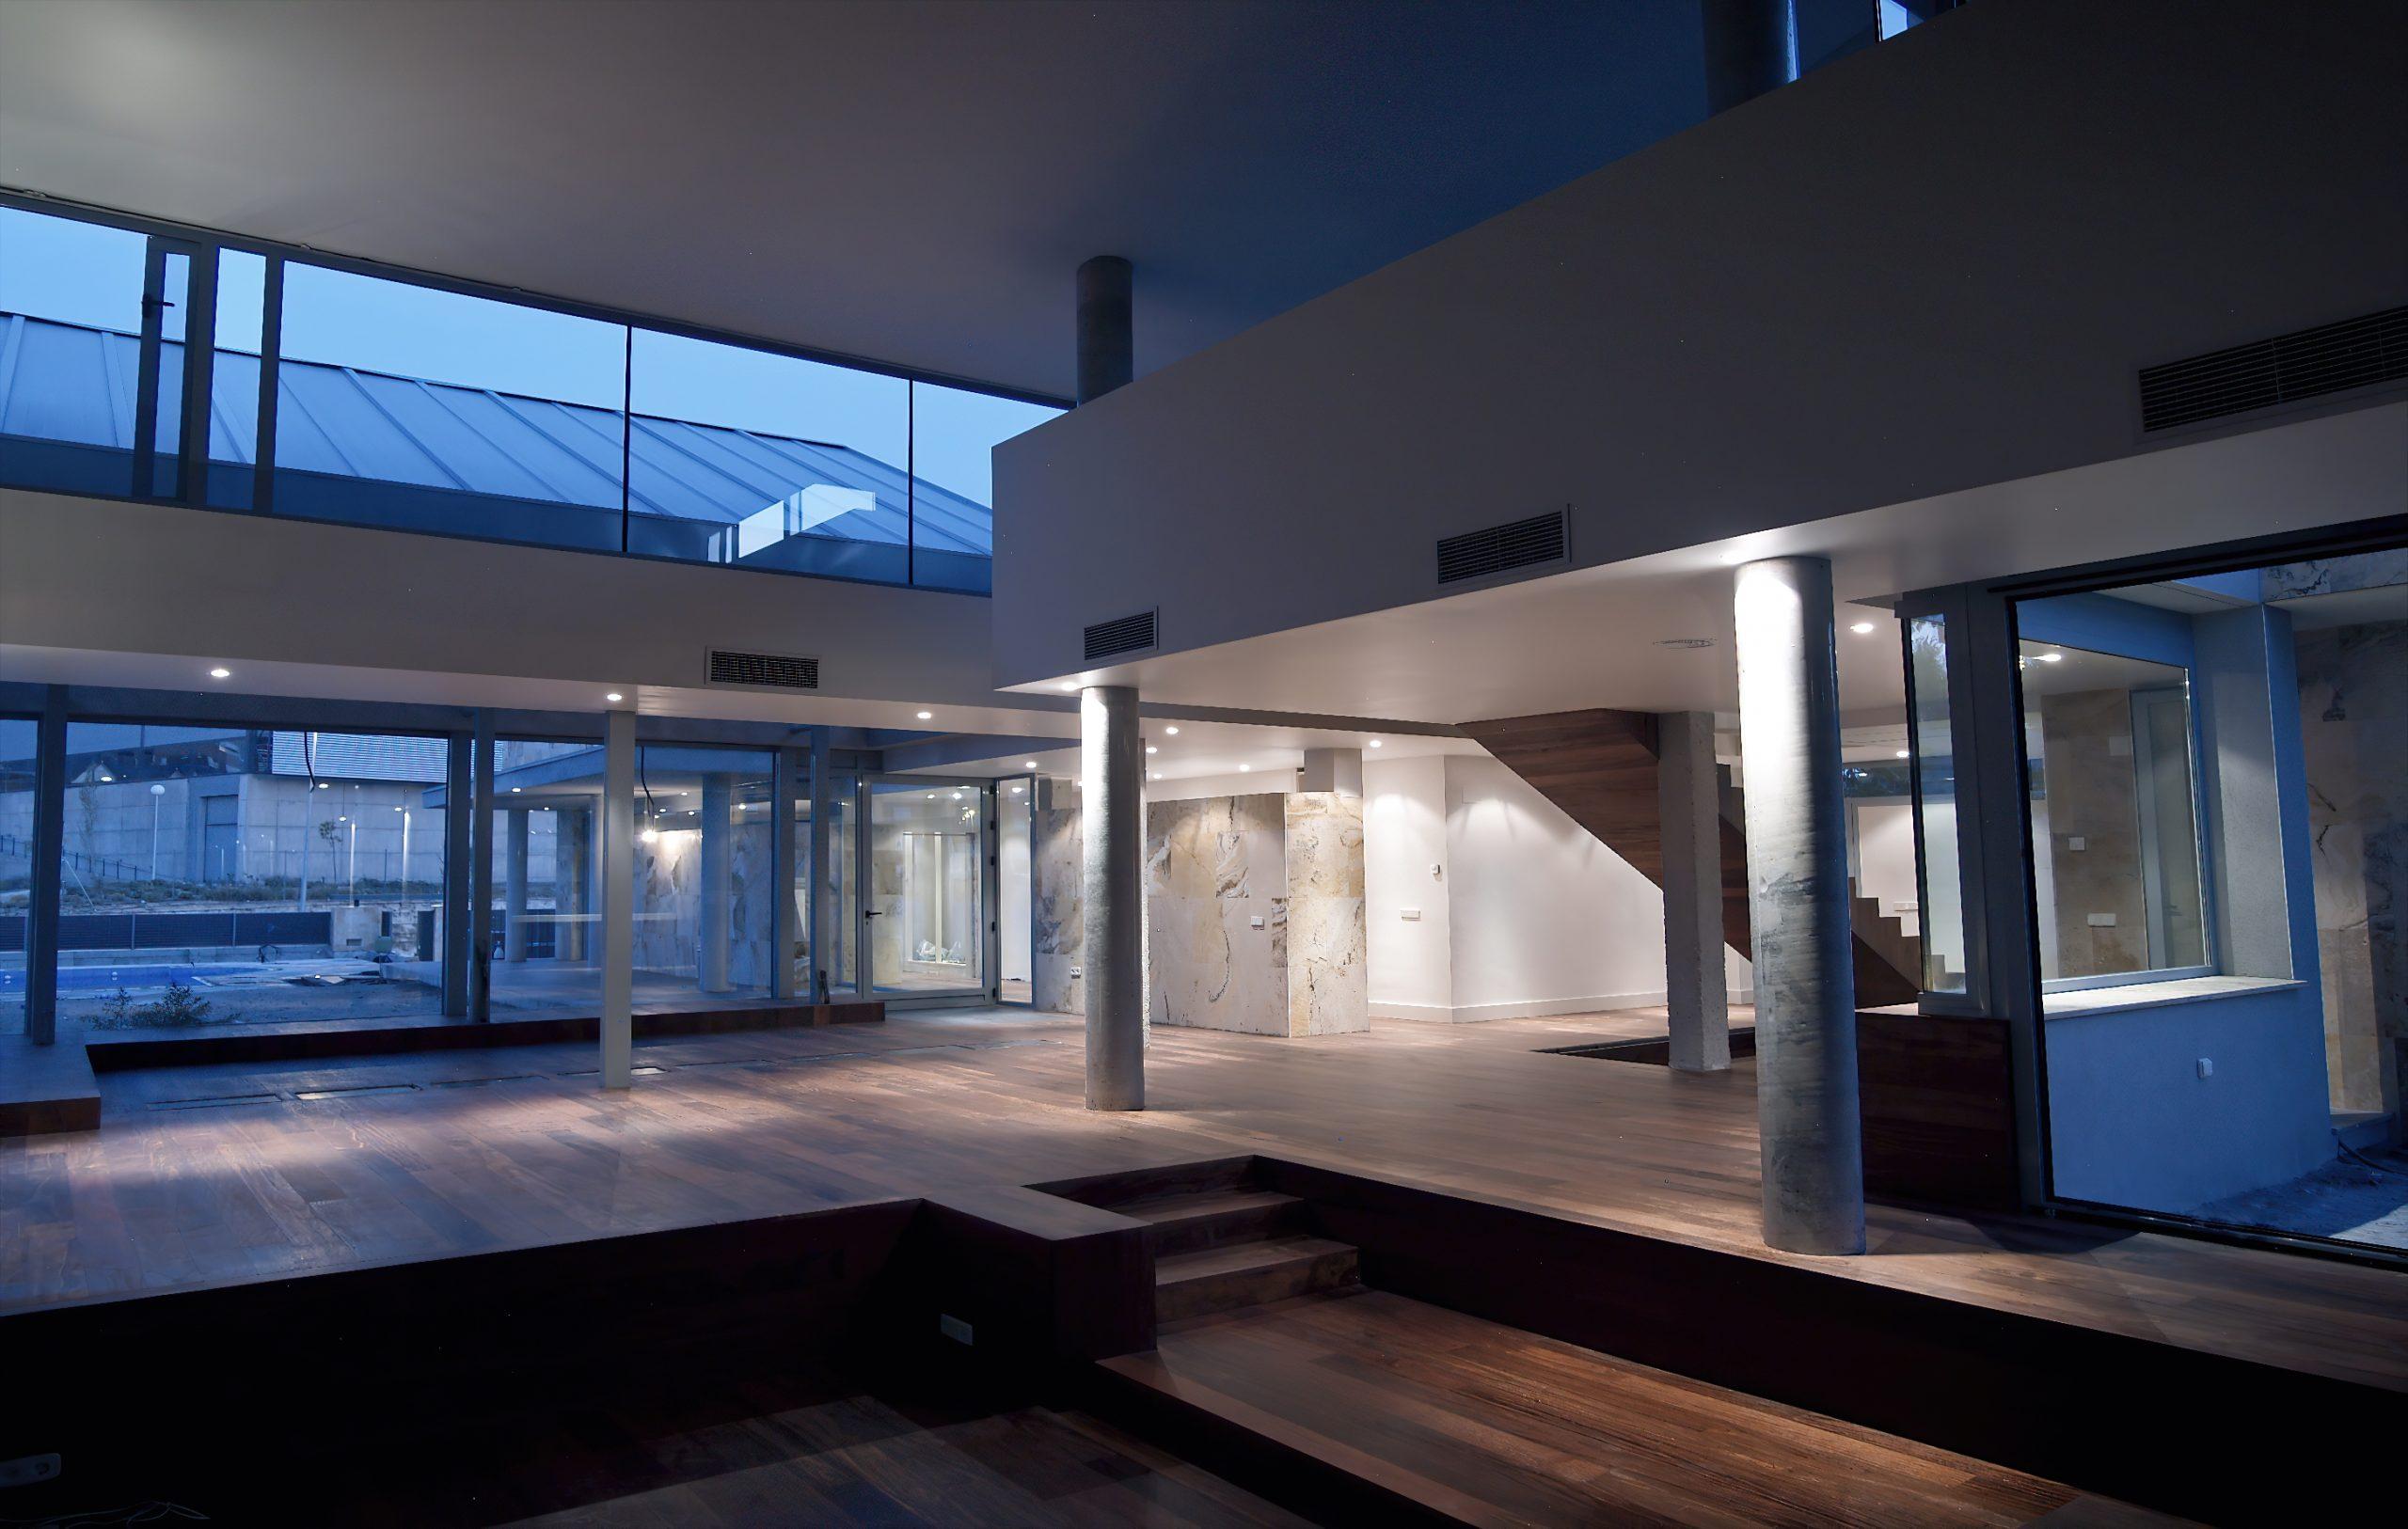 Casa de Valdemoro AtGestion Estudio de Arquitectura e interiorismo Madrid Perfect Pixel Publicidad 5-In-scale-1_00x